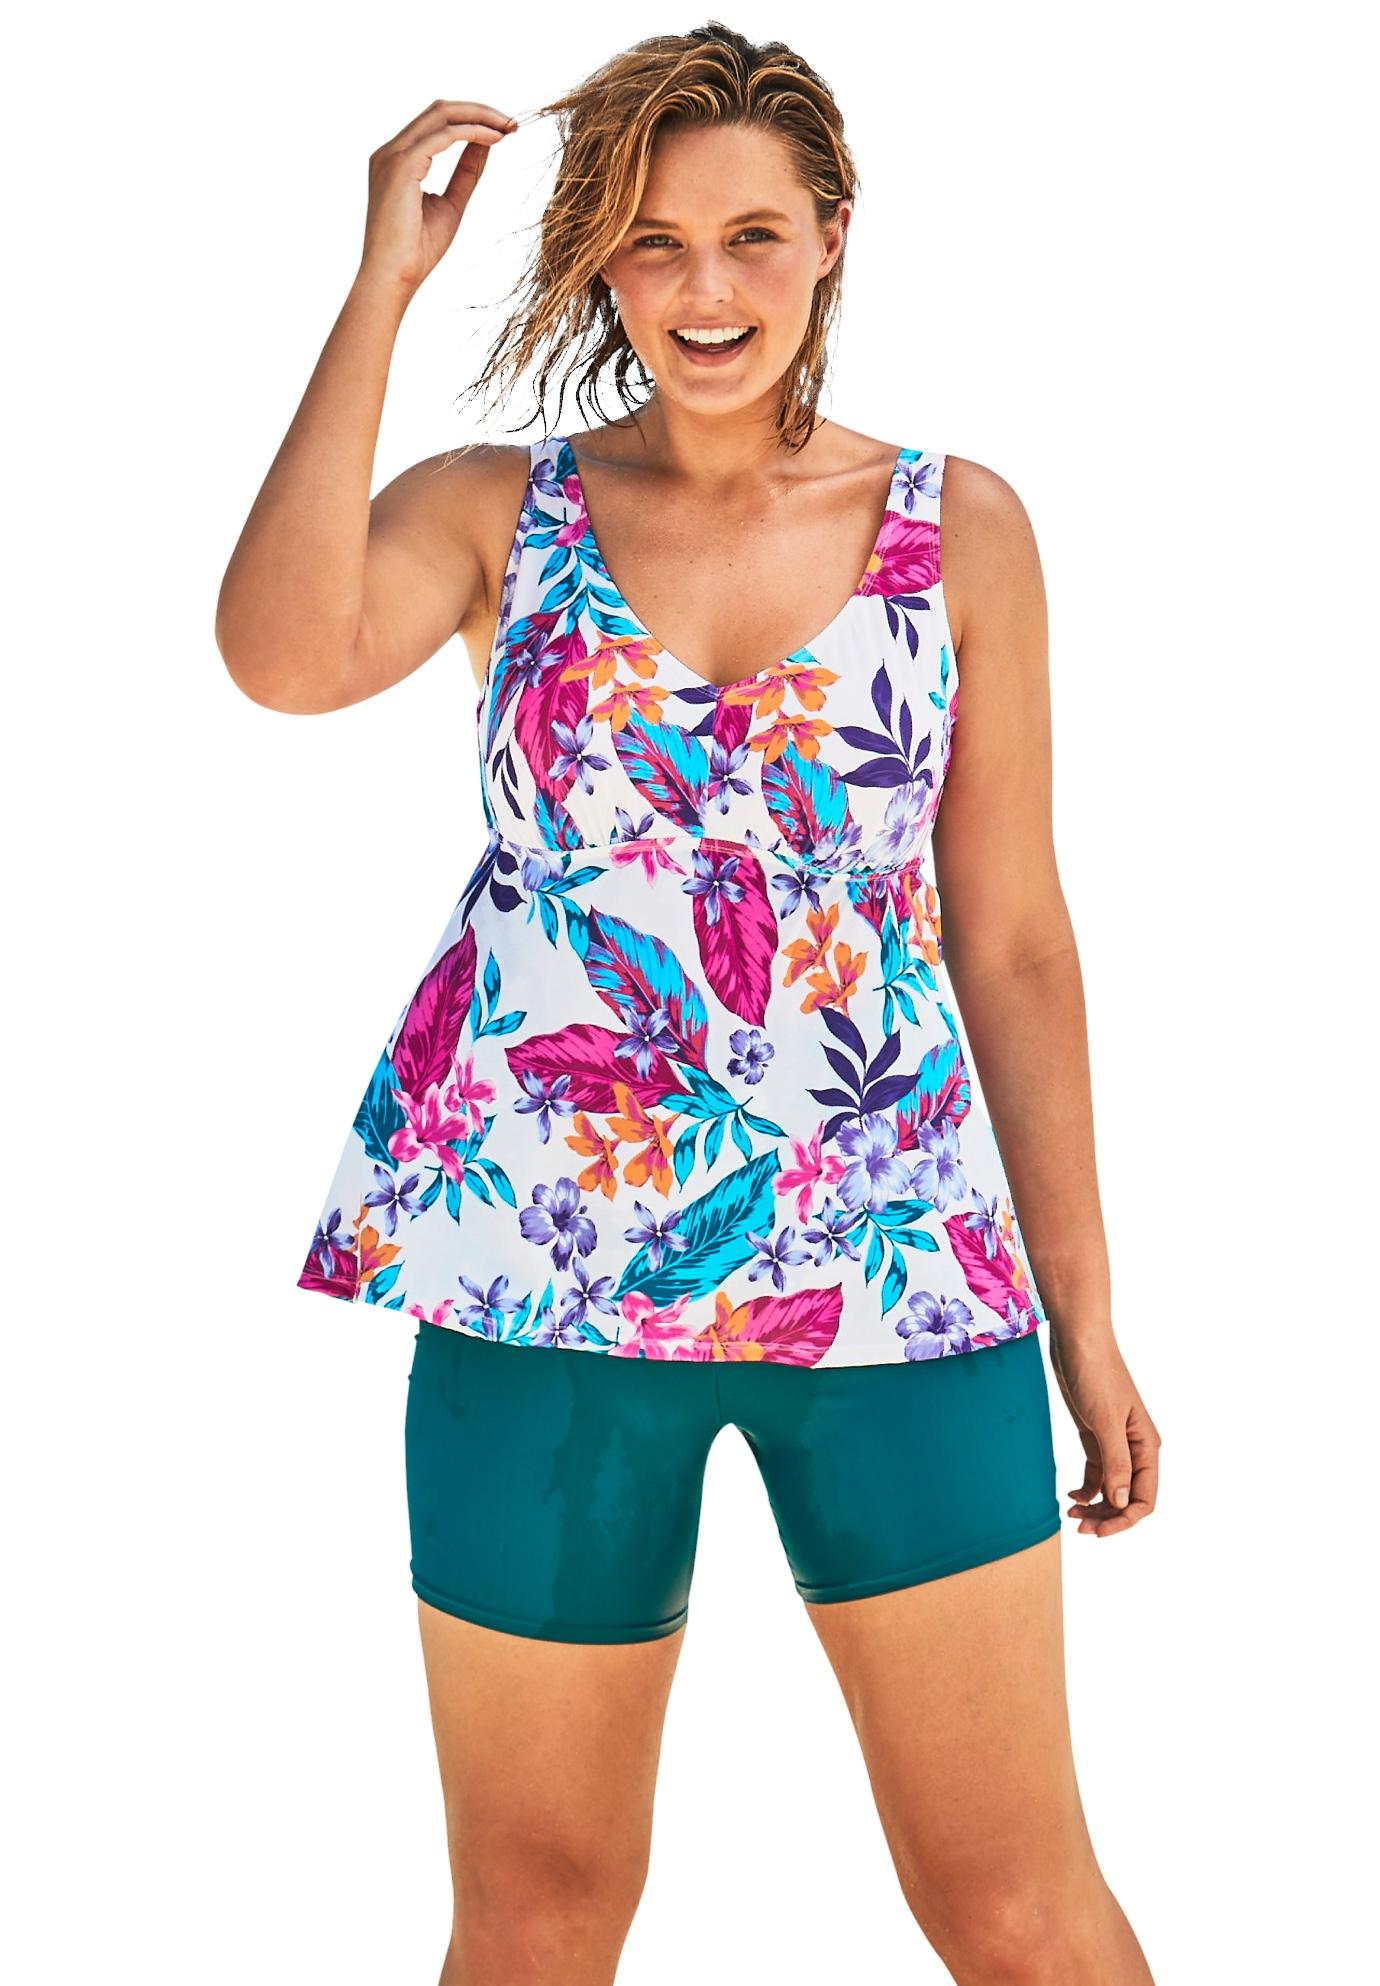 Plus Size Women's Flowy Tankini Top by Swim 365 in White Paradise Floral